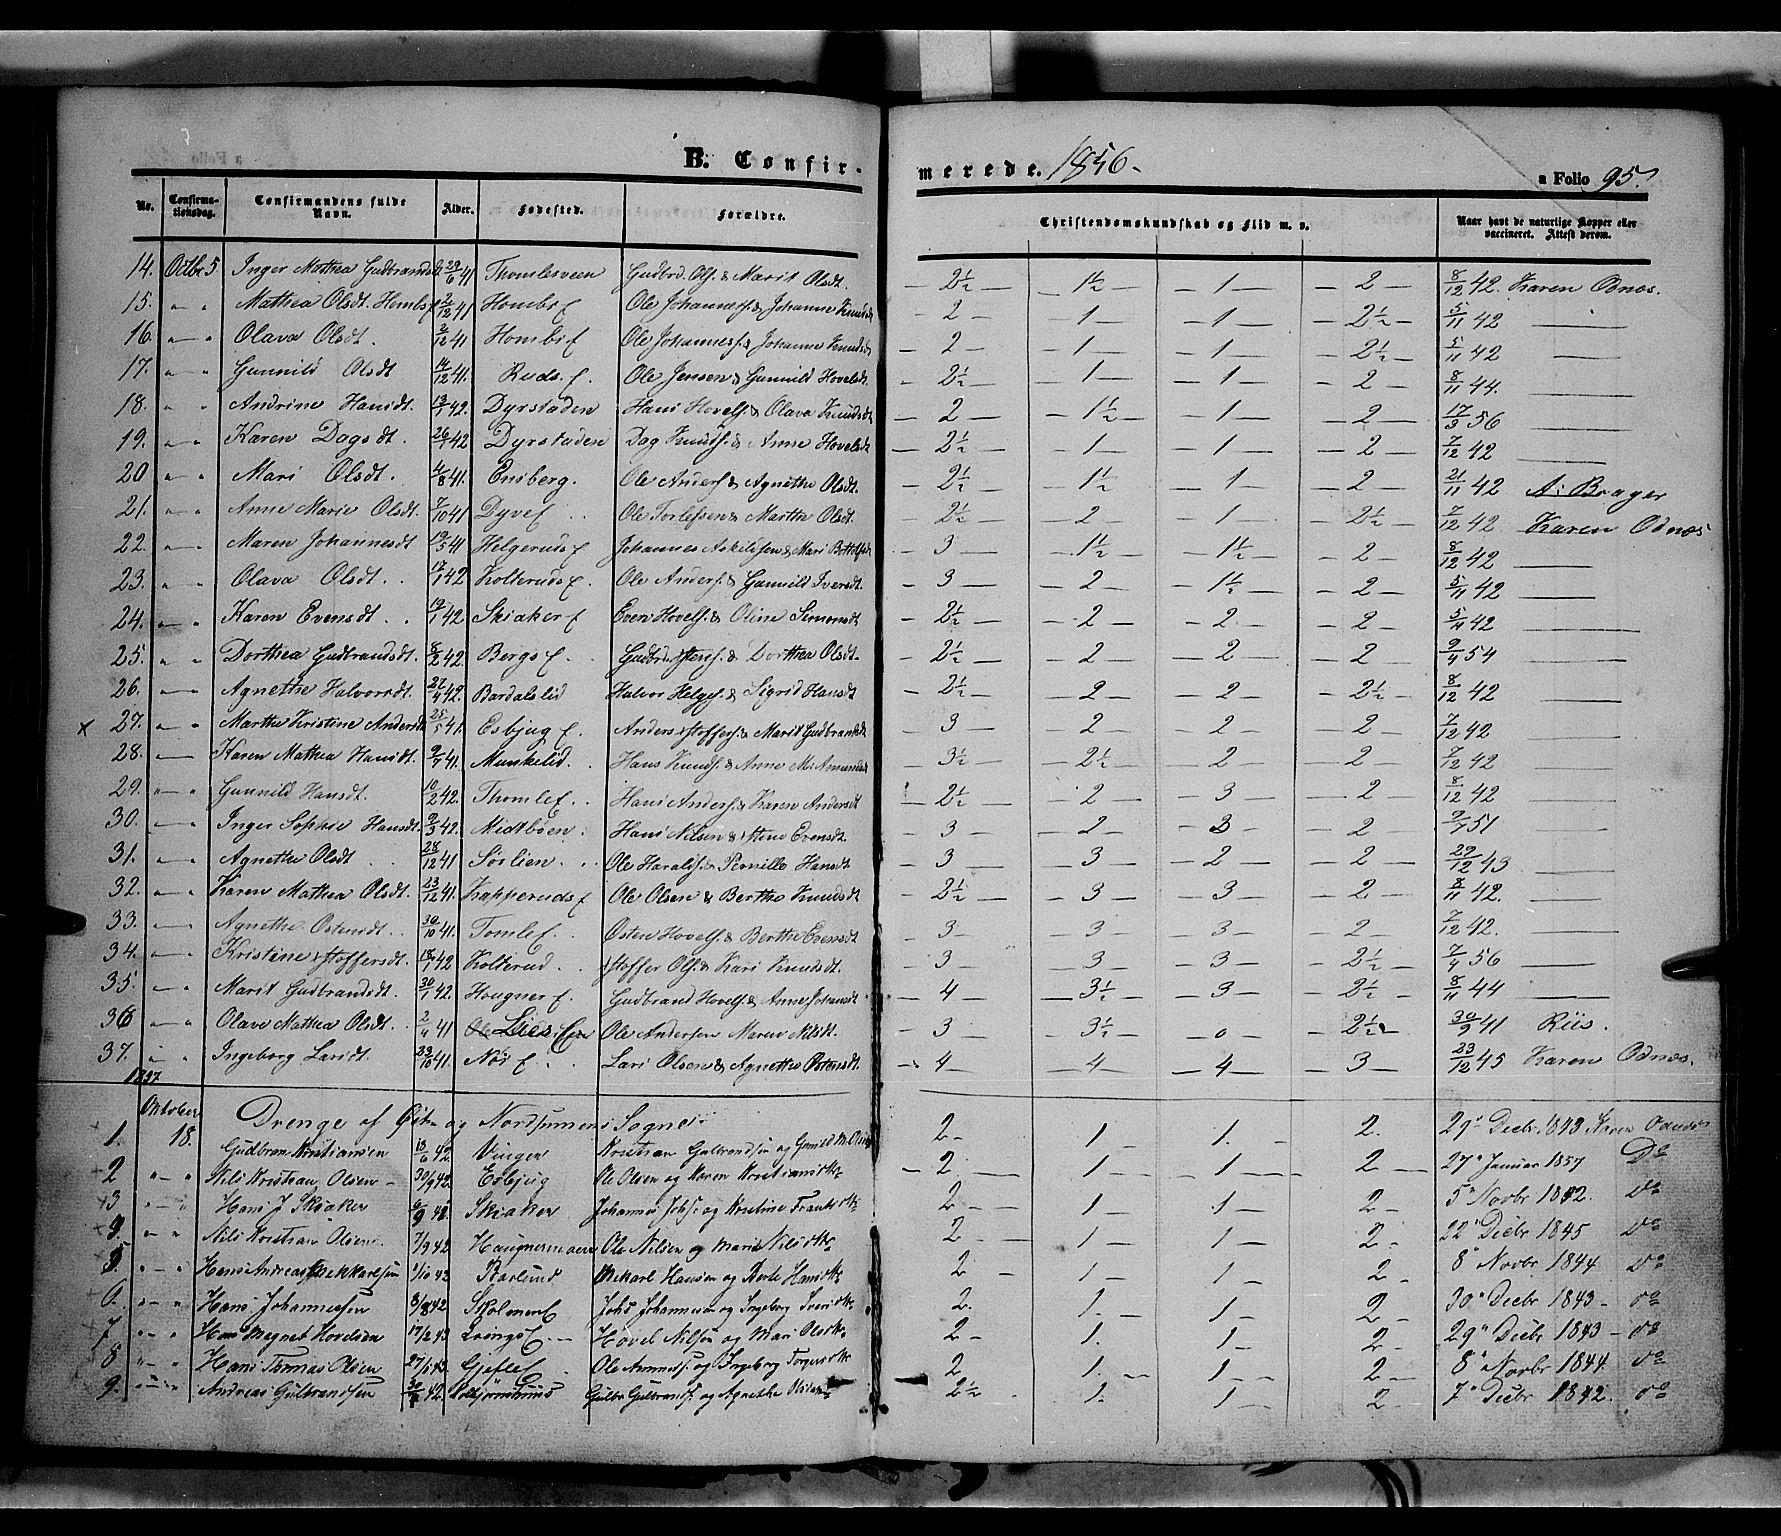 SAH, Land prestekontor, Ministerialbok nr. 10, 1847-1859, s. 95